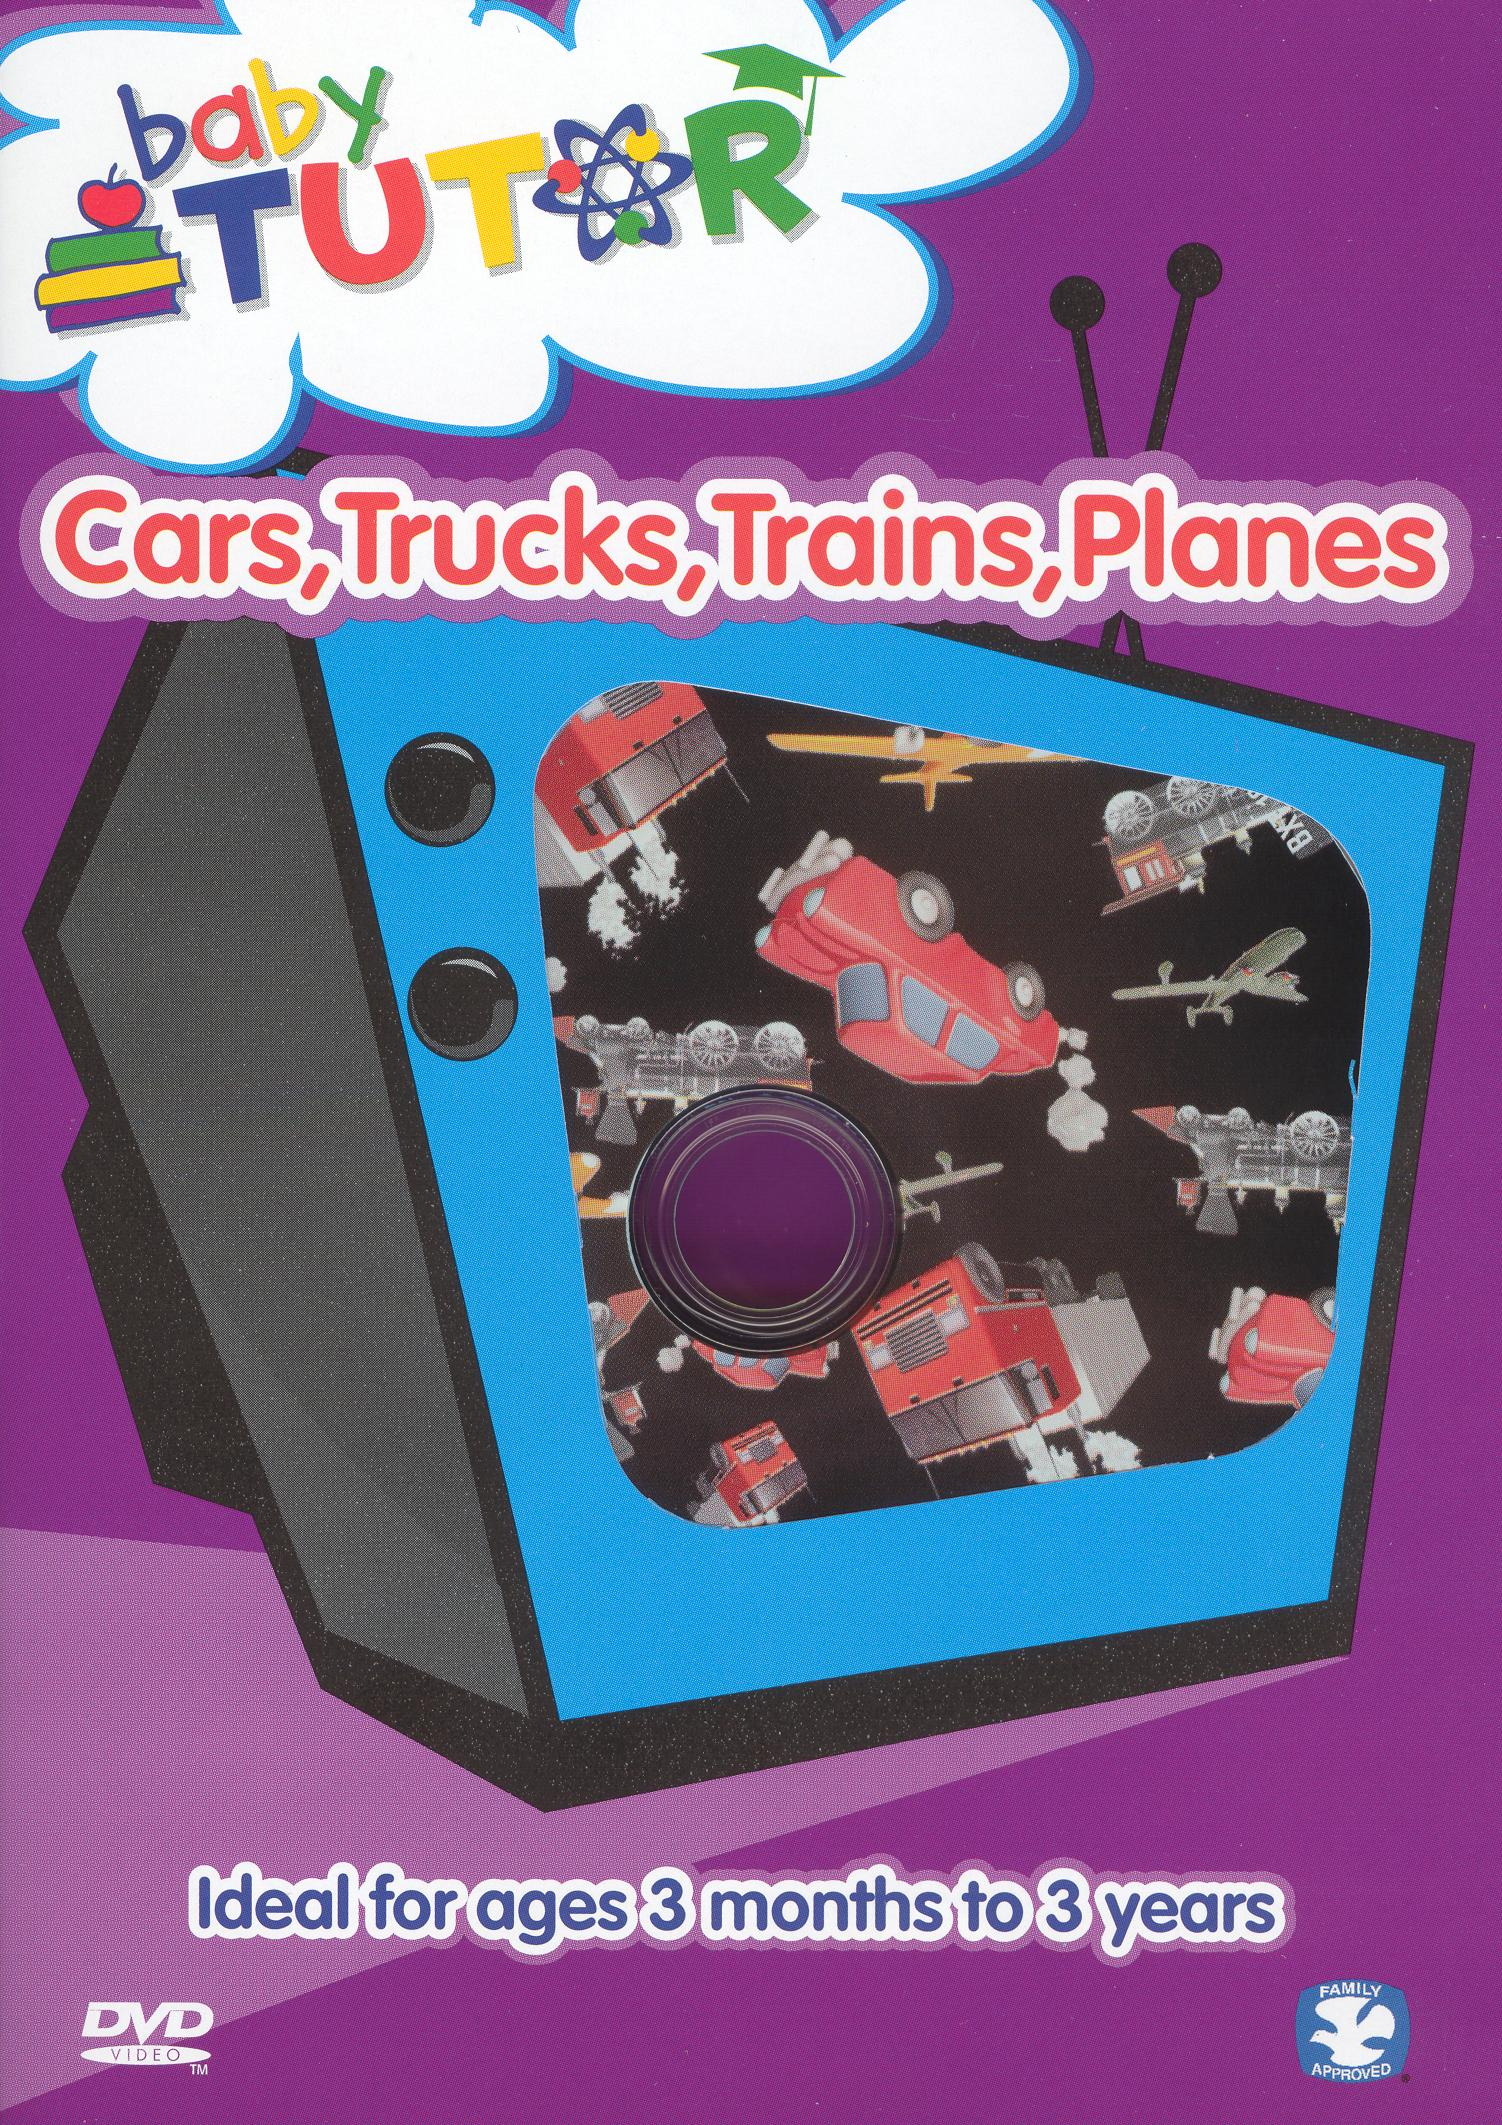 Baby Tutor: Cars, Trucks, Trains, Planes